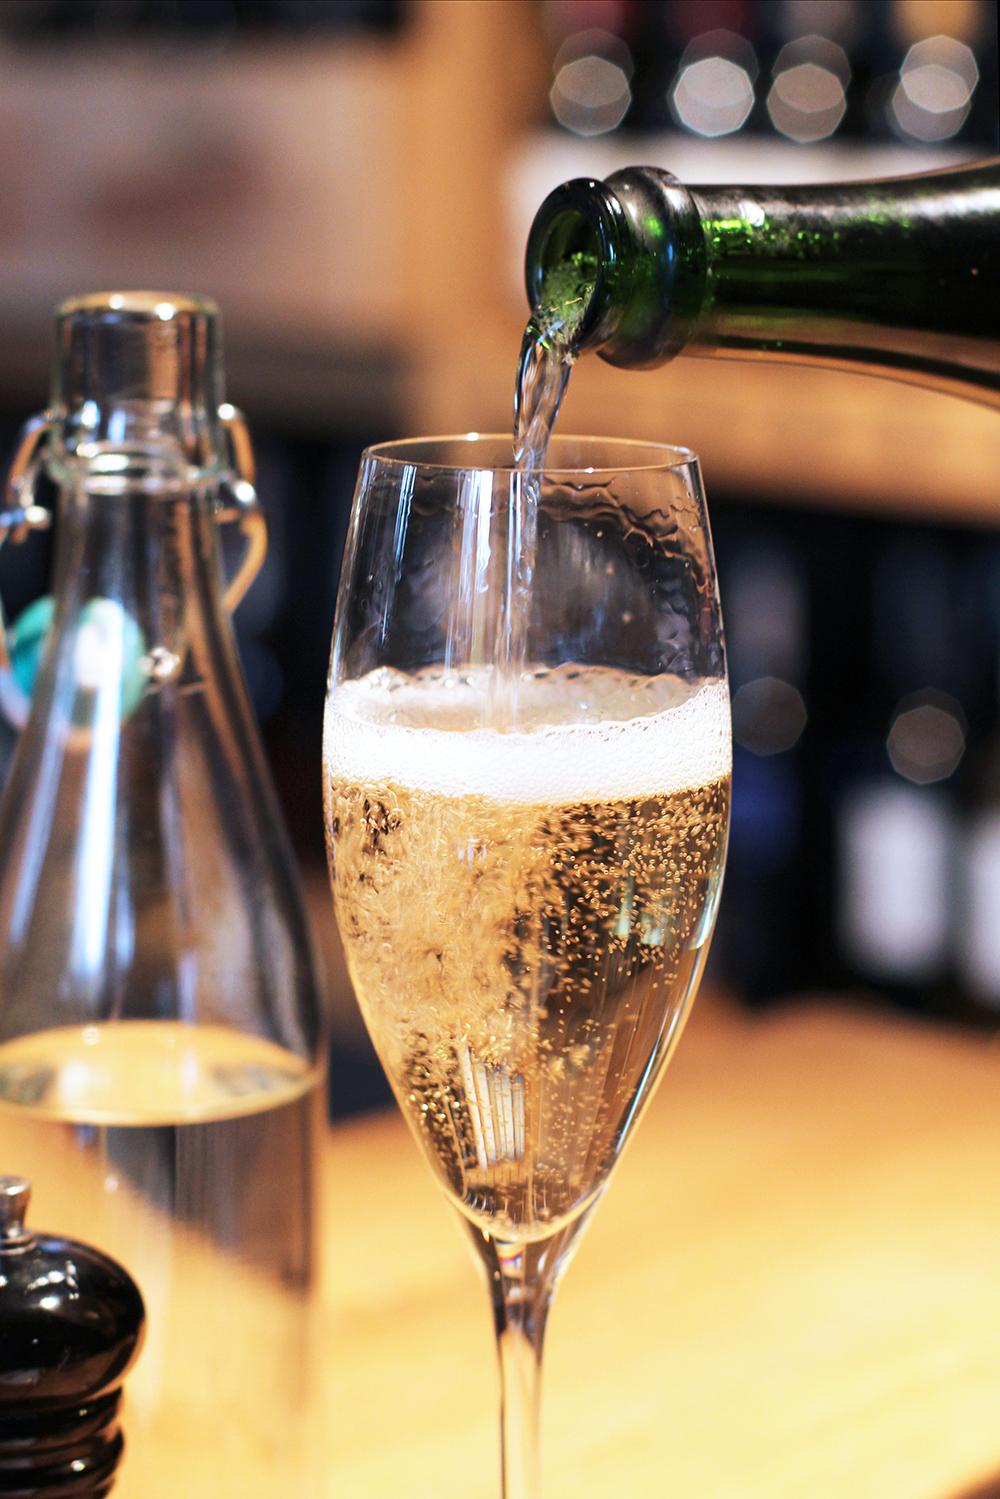 Champagne at Rozbrat 20 Restaurant, Warsaw - travel & lifestyle blog